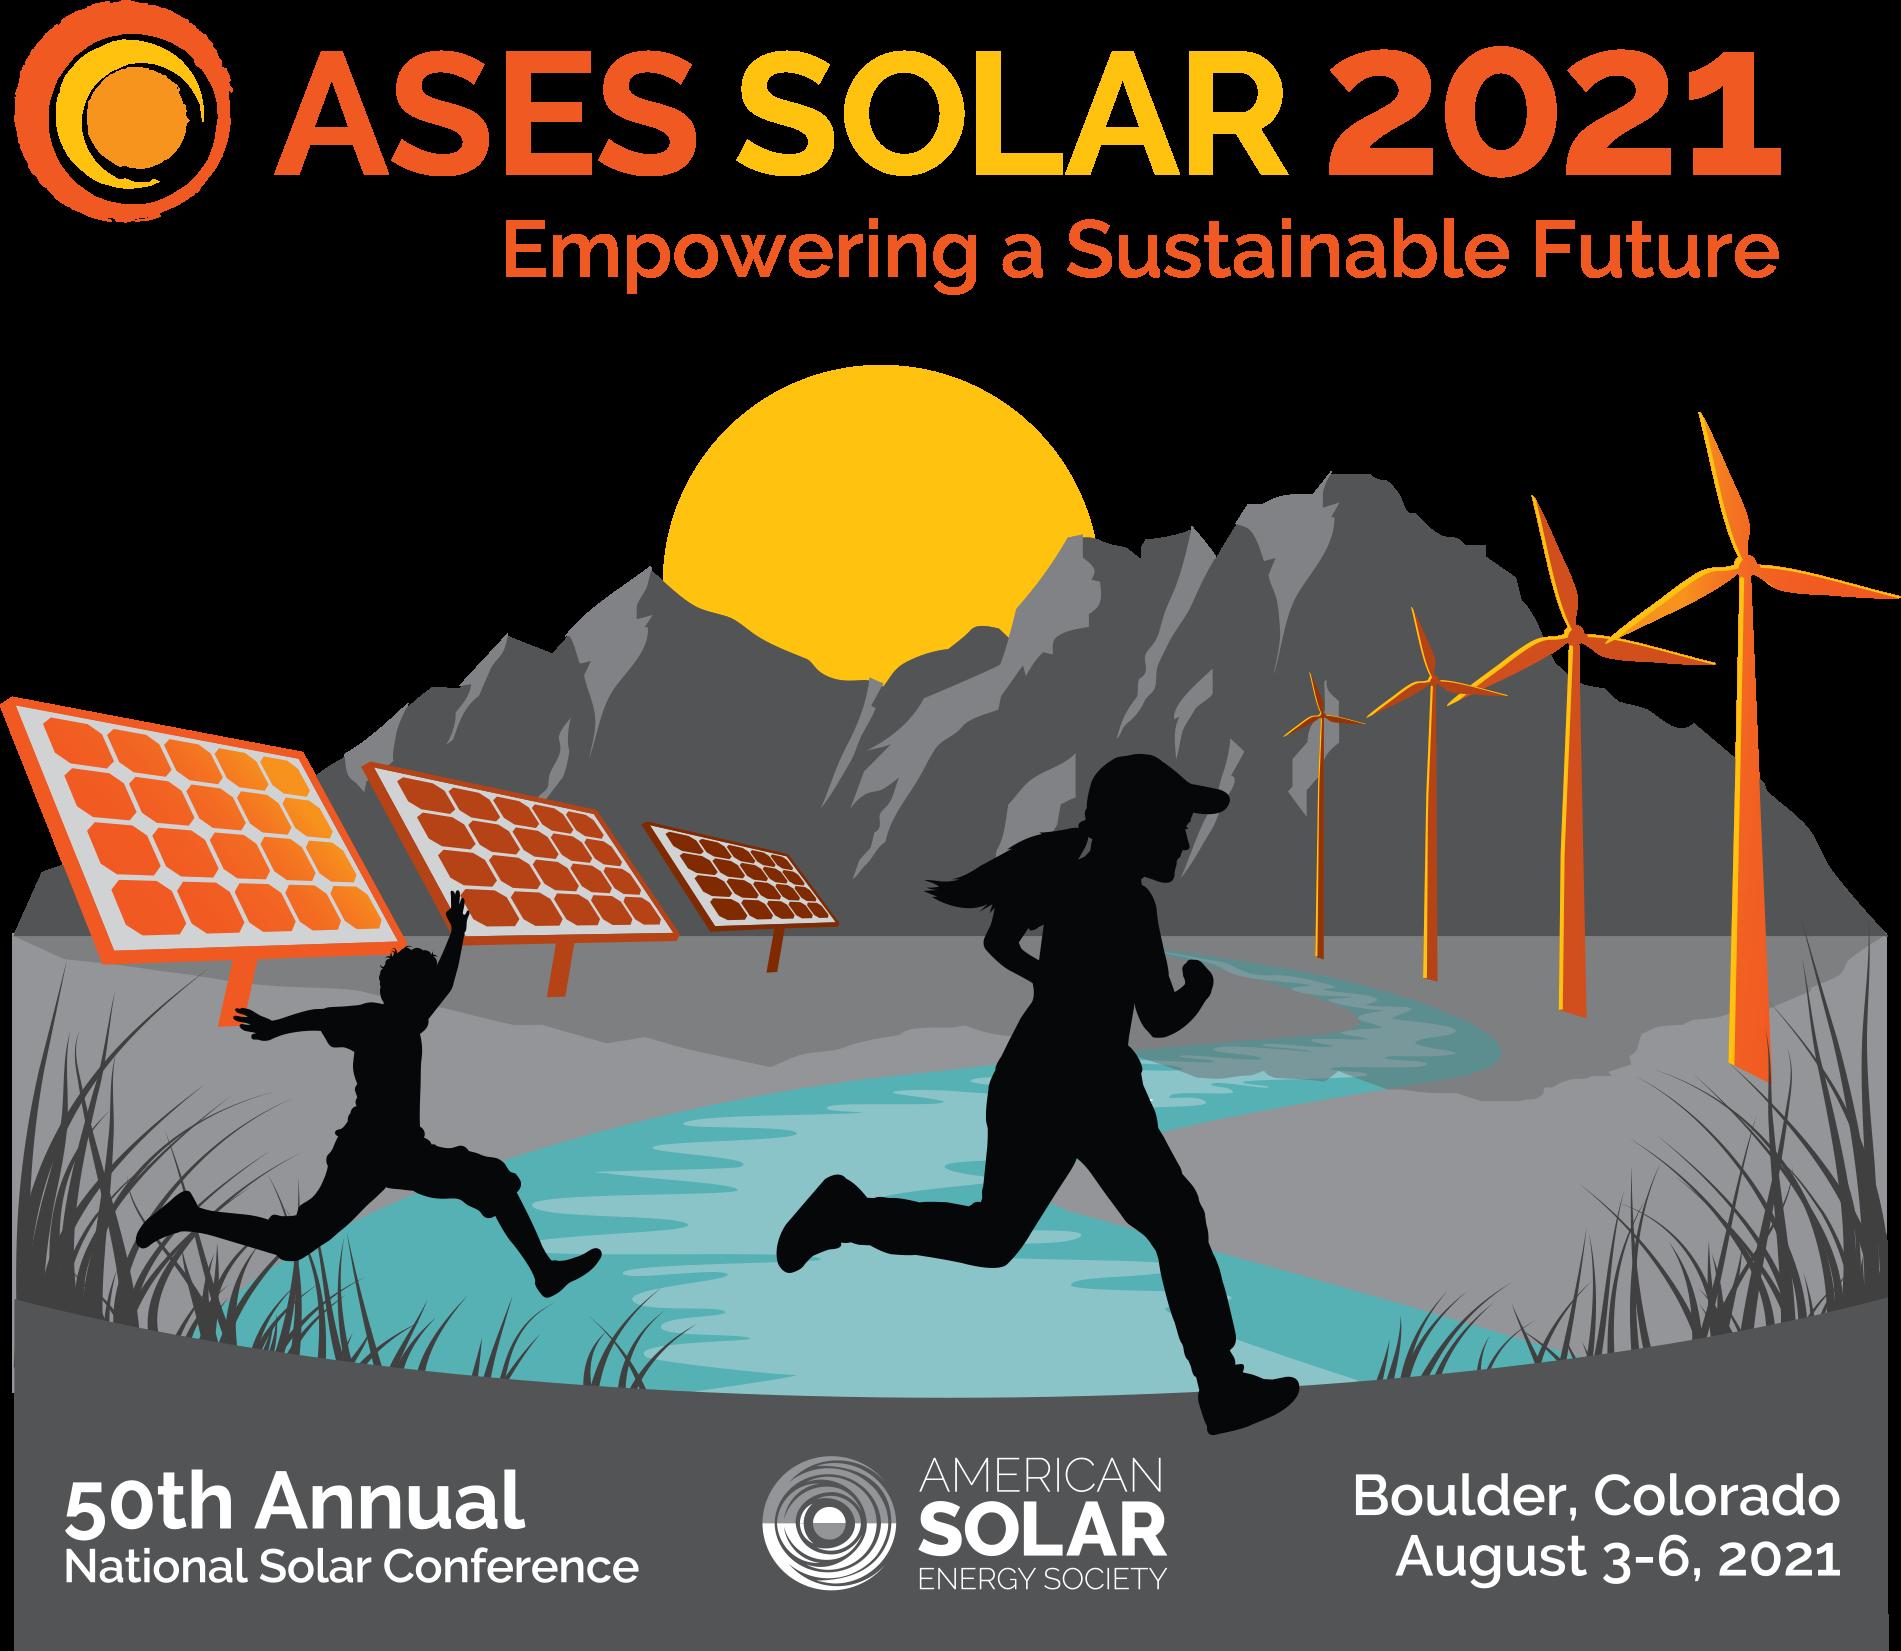 ASES SOLAR 2021